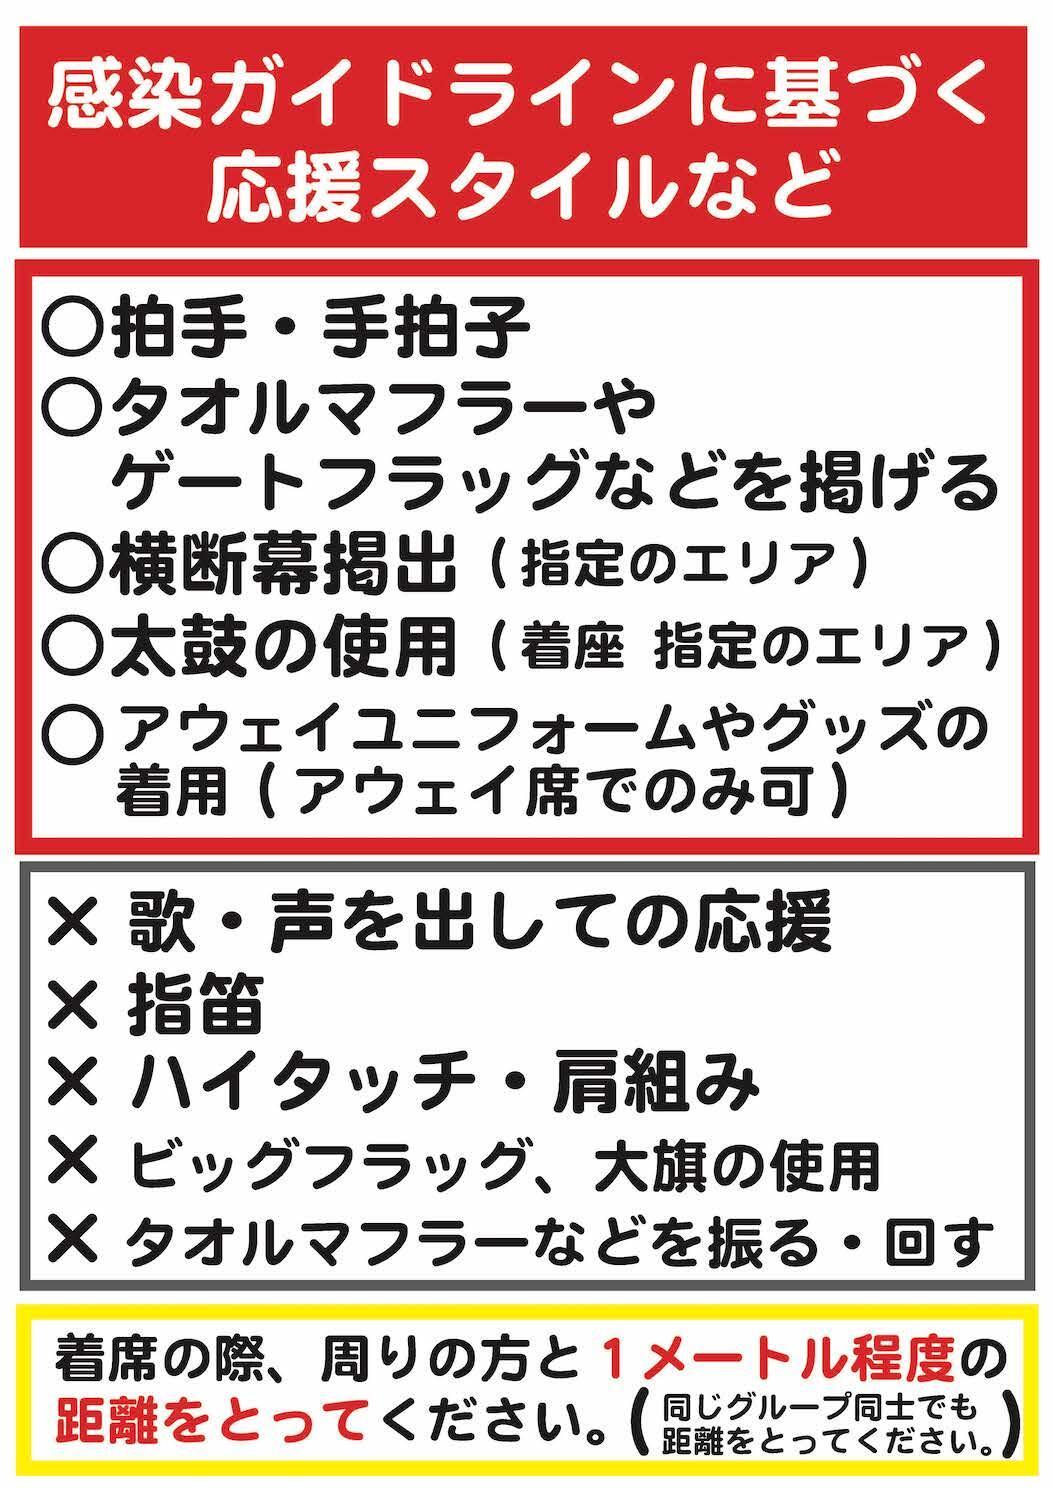 https://www.tsukuba-fc.com/info/res/images/info/ac77640456741d6d8858cf236abe9789e2ae1906.jpg